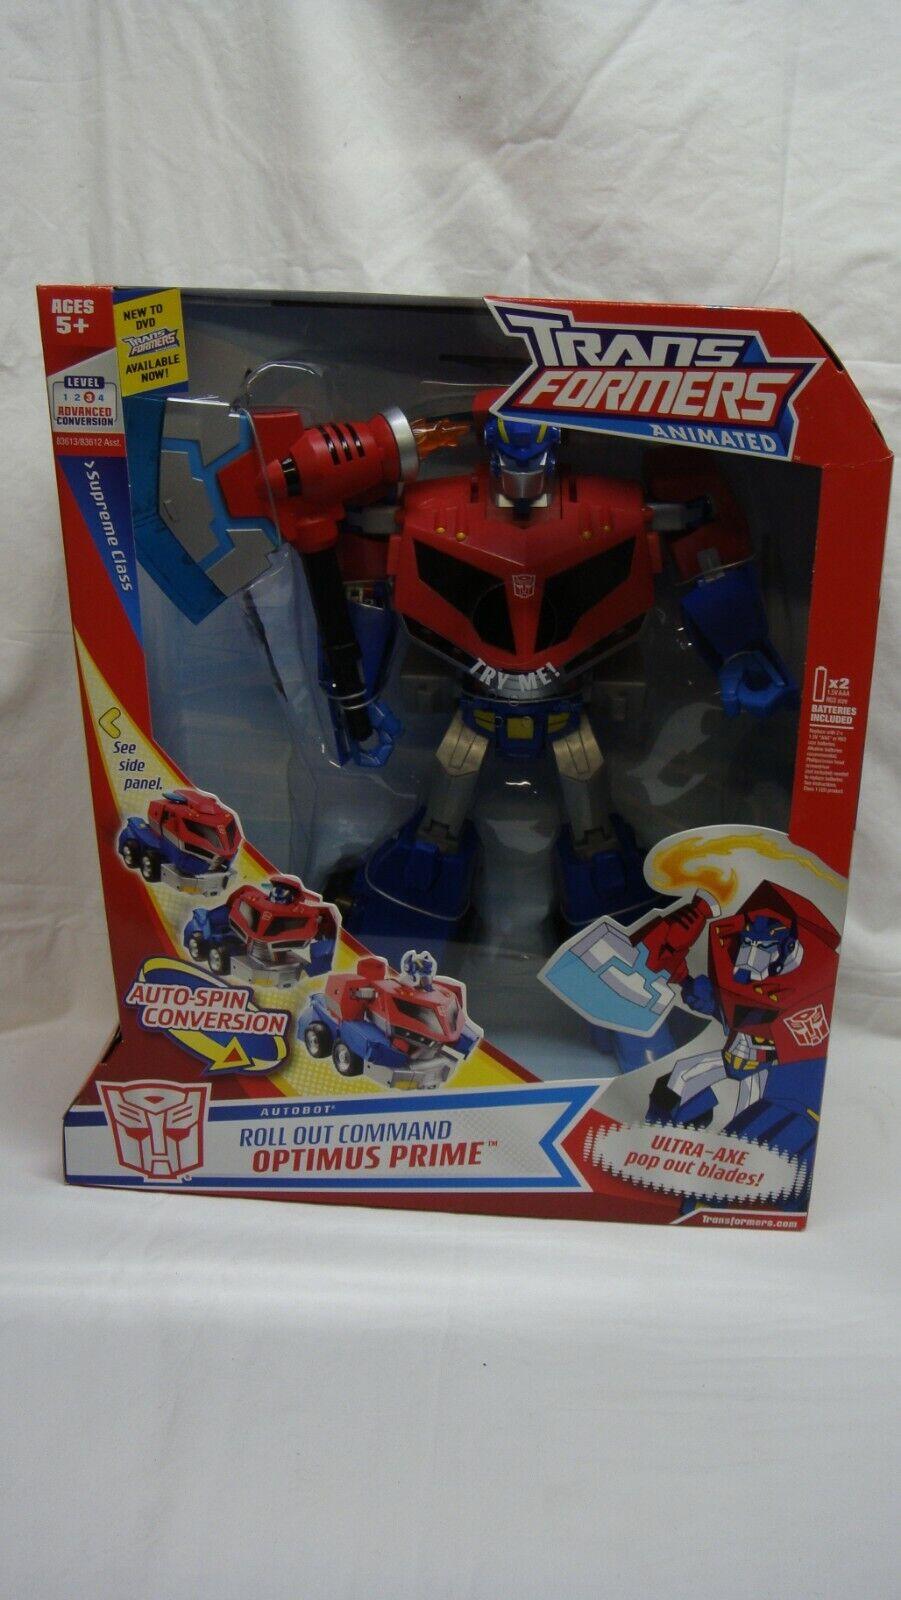 Transformers Animated desplegar comando Optimus Prime Luces habla  Supremo  nuevo